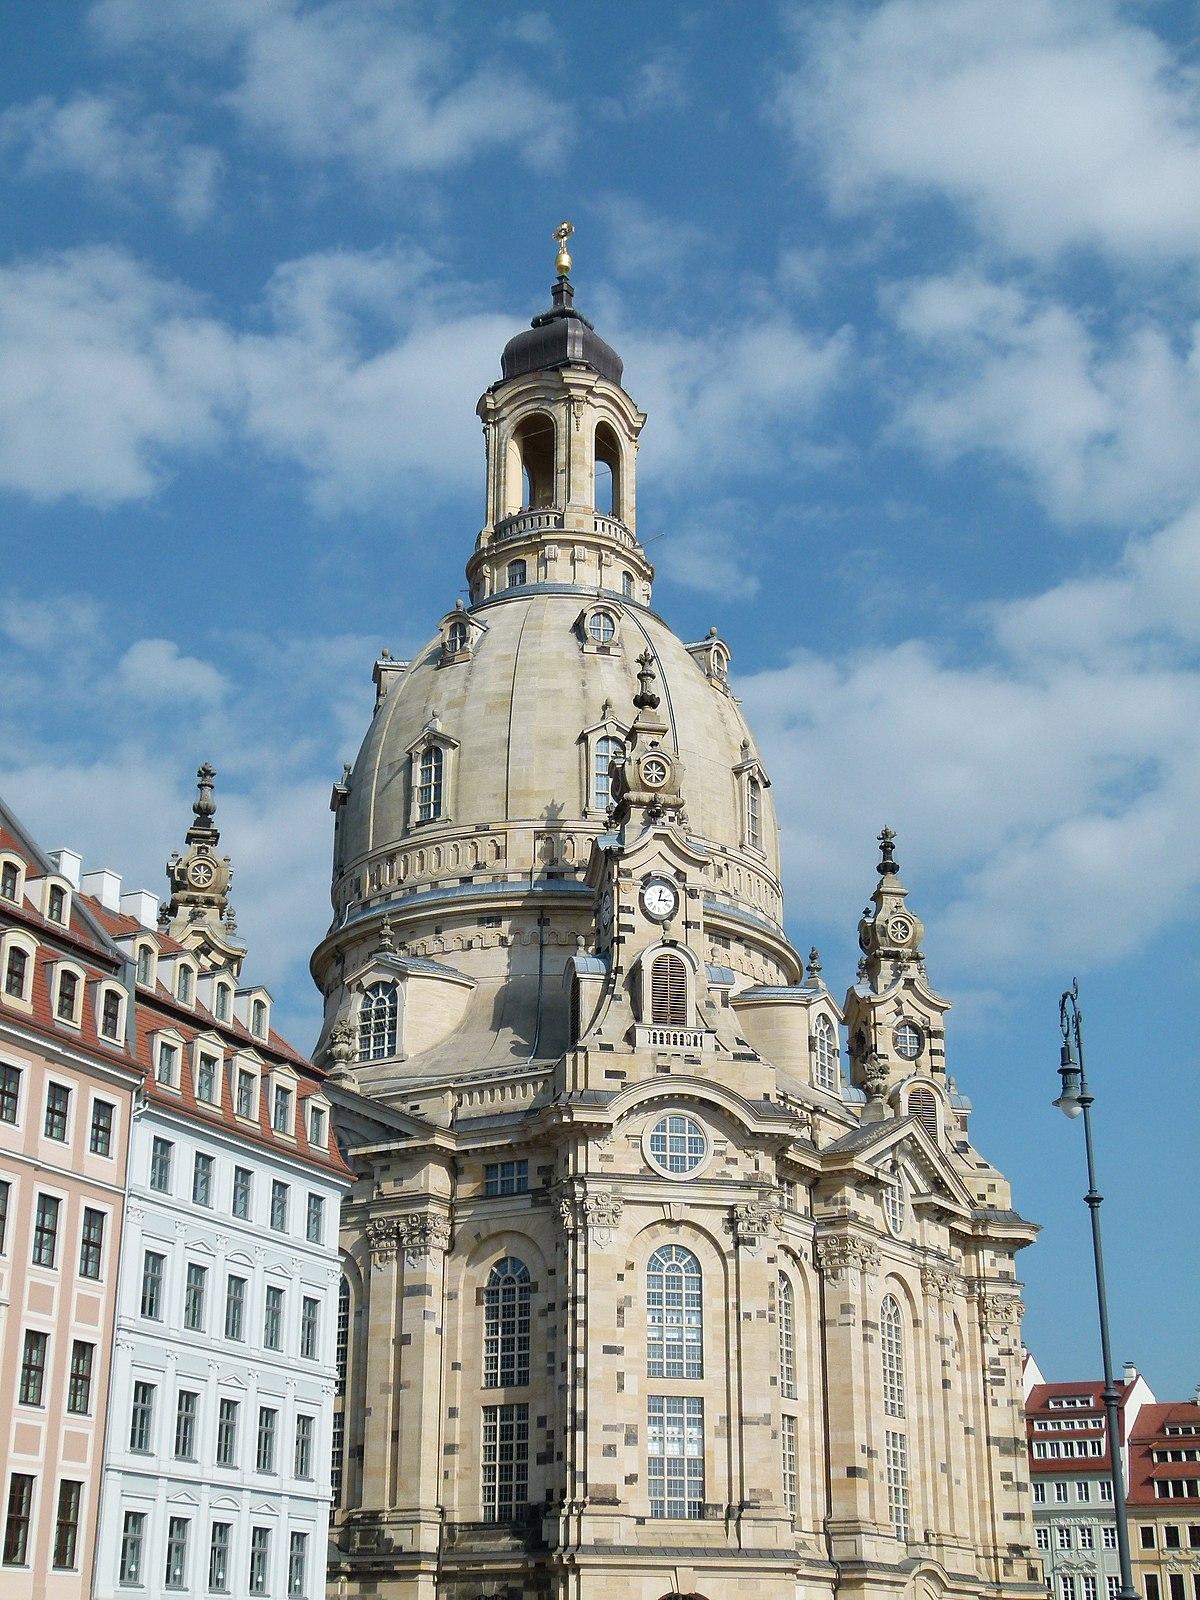 File:Die Frauenkirche in Dresden 2.jpg - Wikimedia Commons